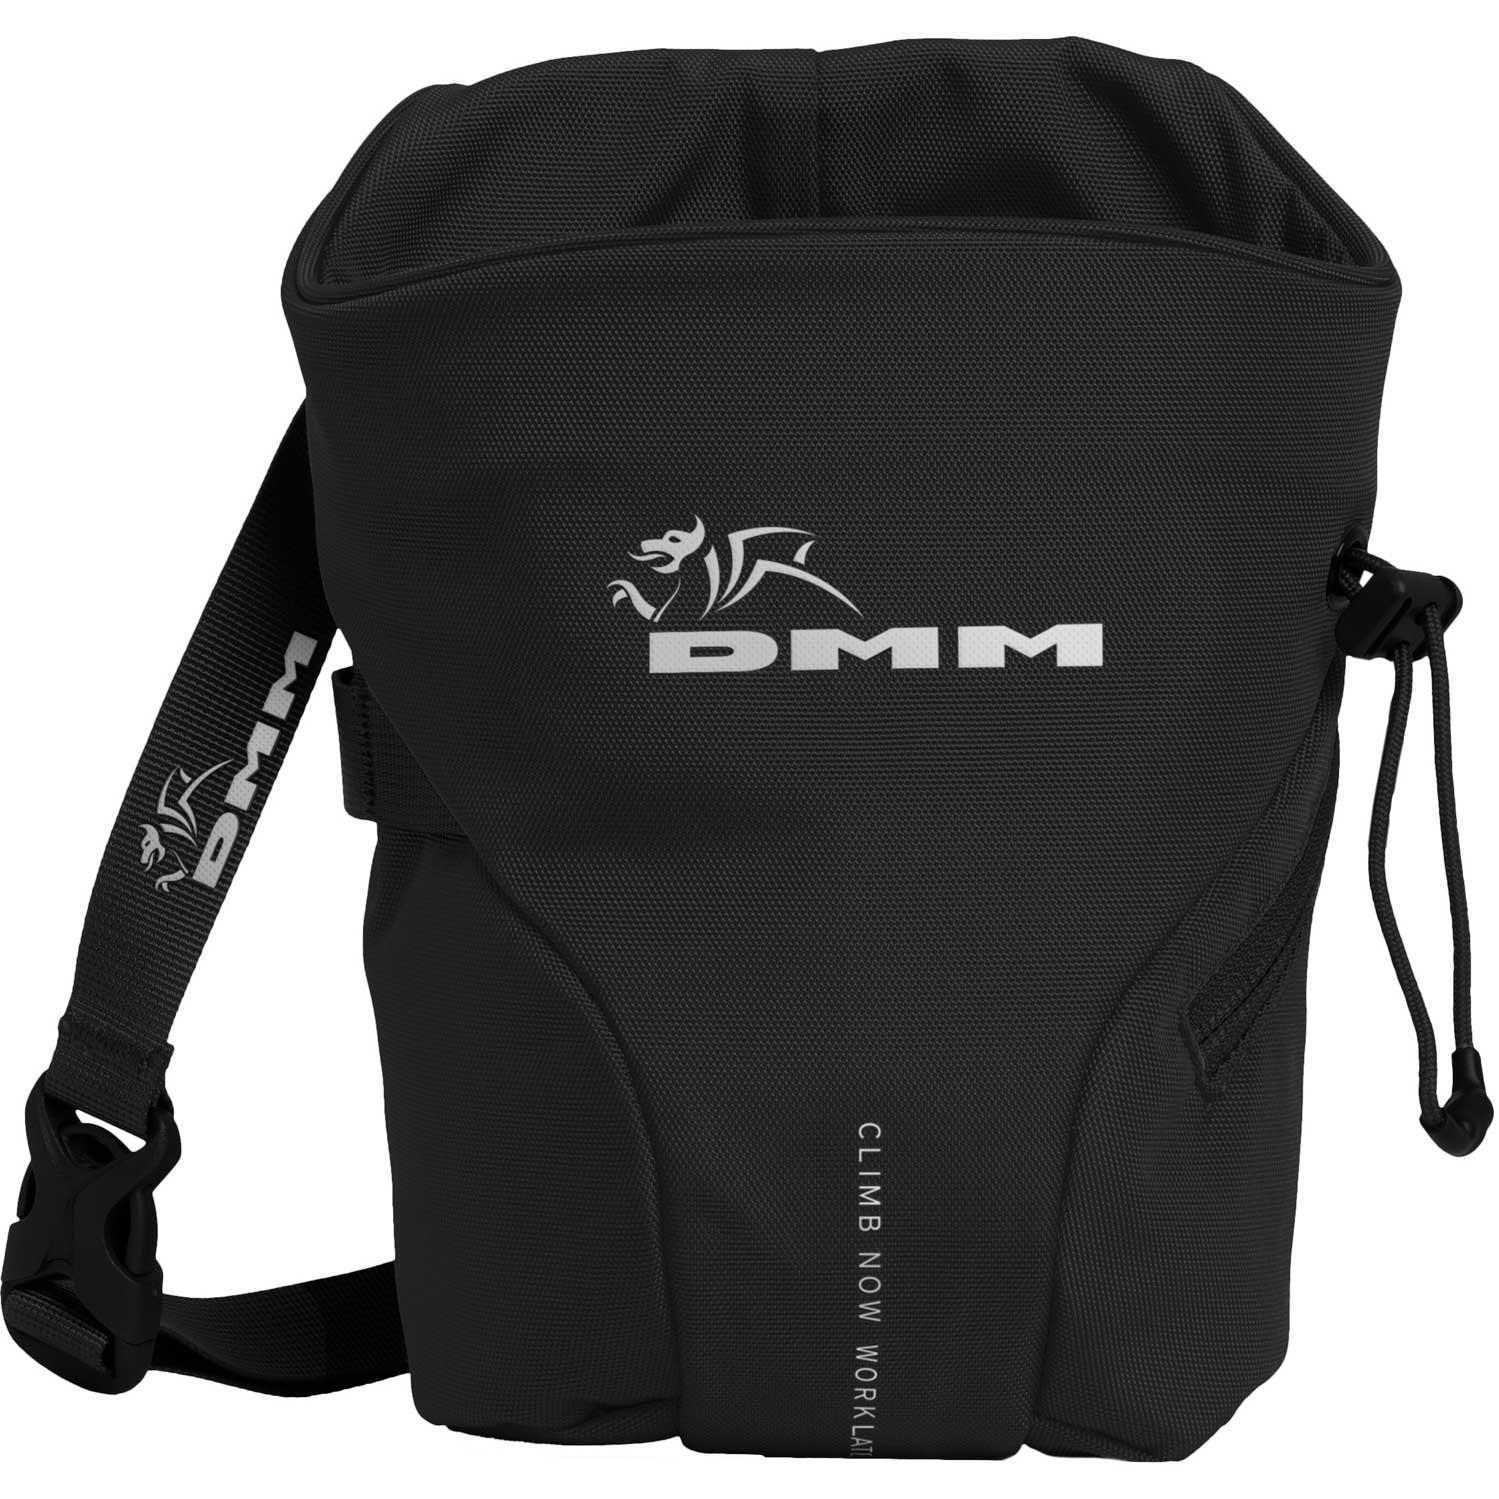 DMM Trad Chalk Bag - Black